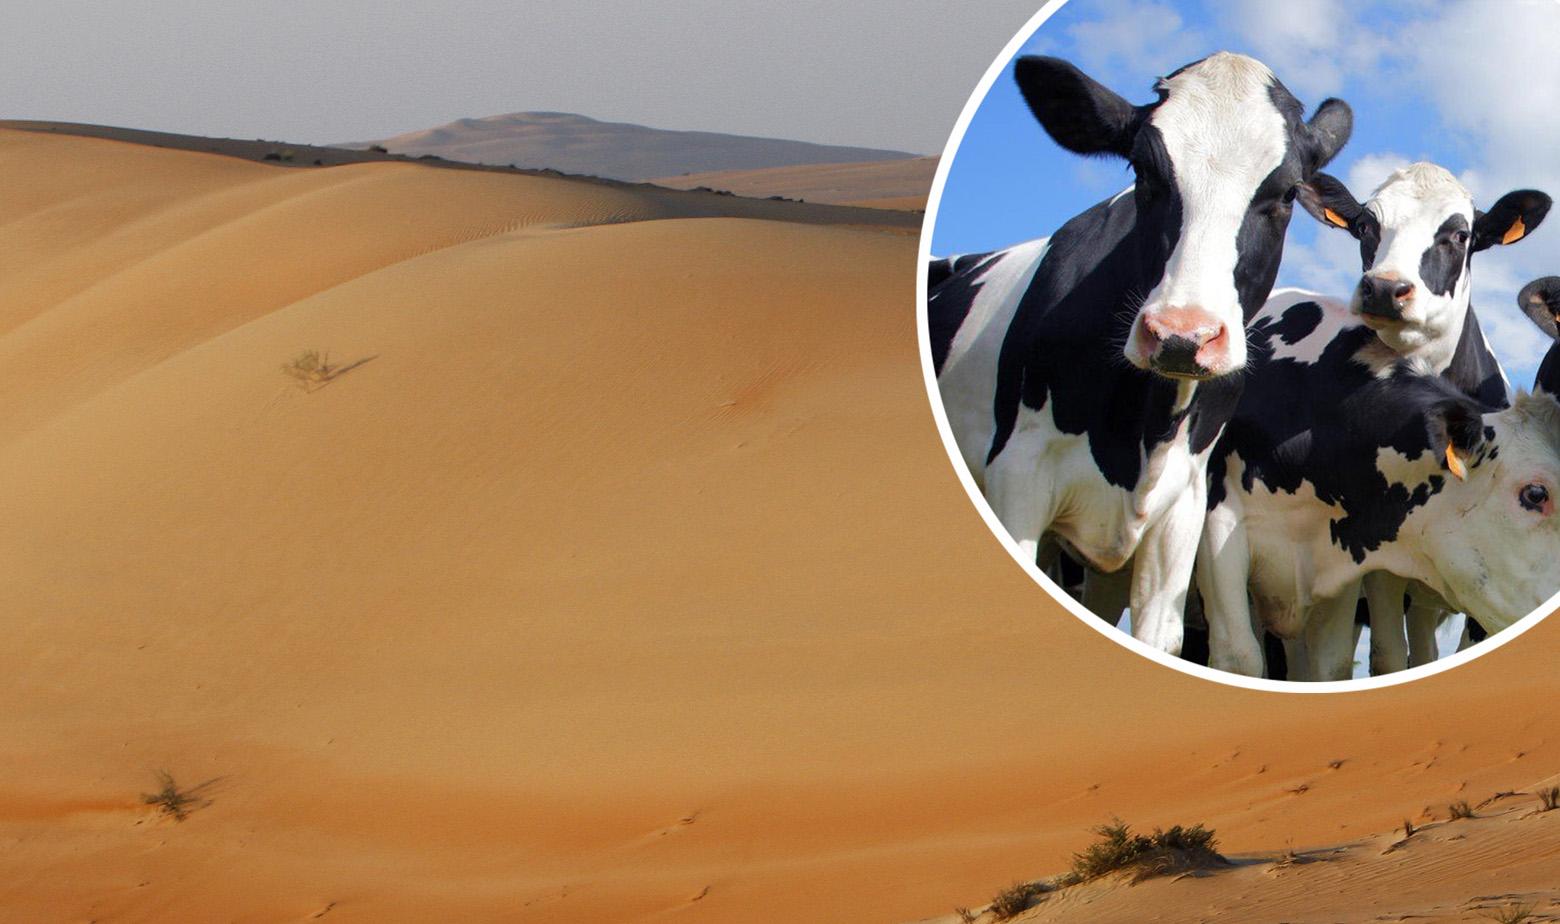 Ilustracija: pustinja i goveda u krugu